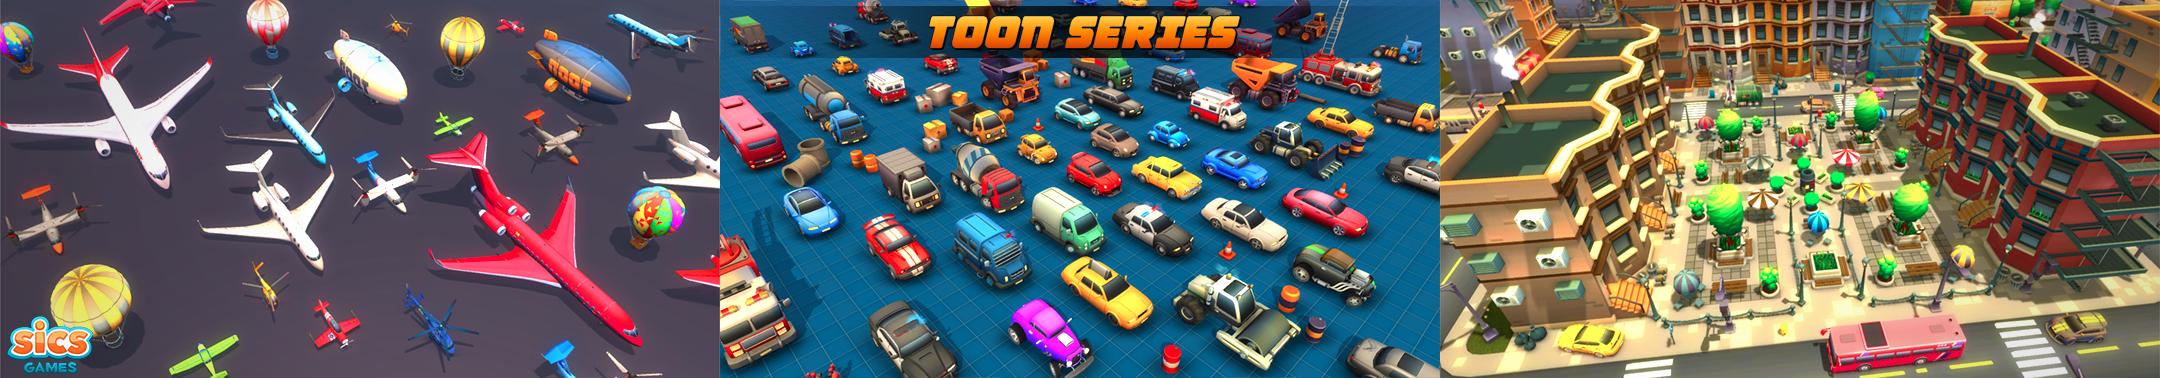 Toon Series [growing content